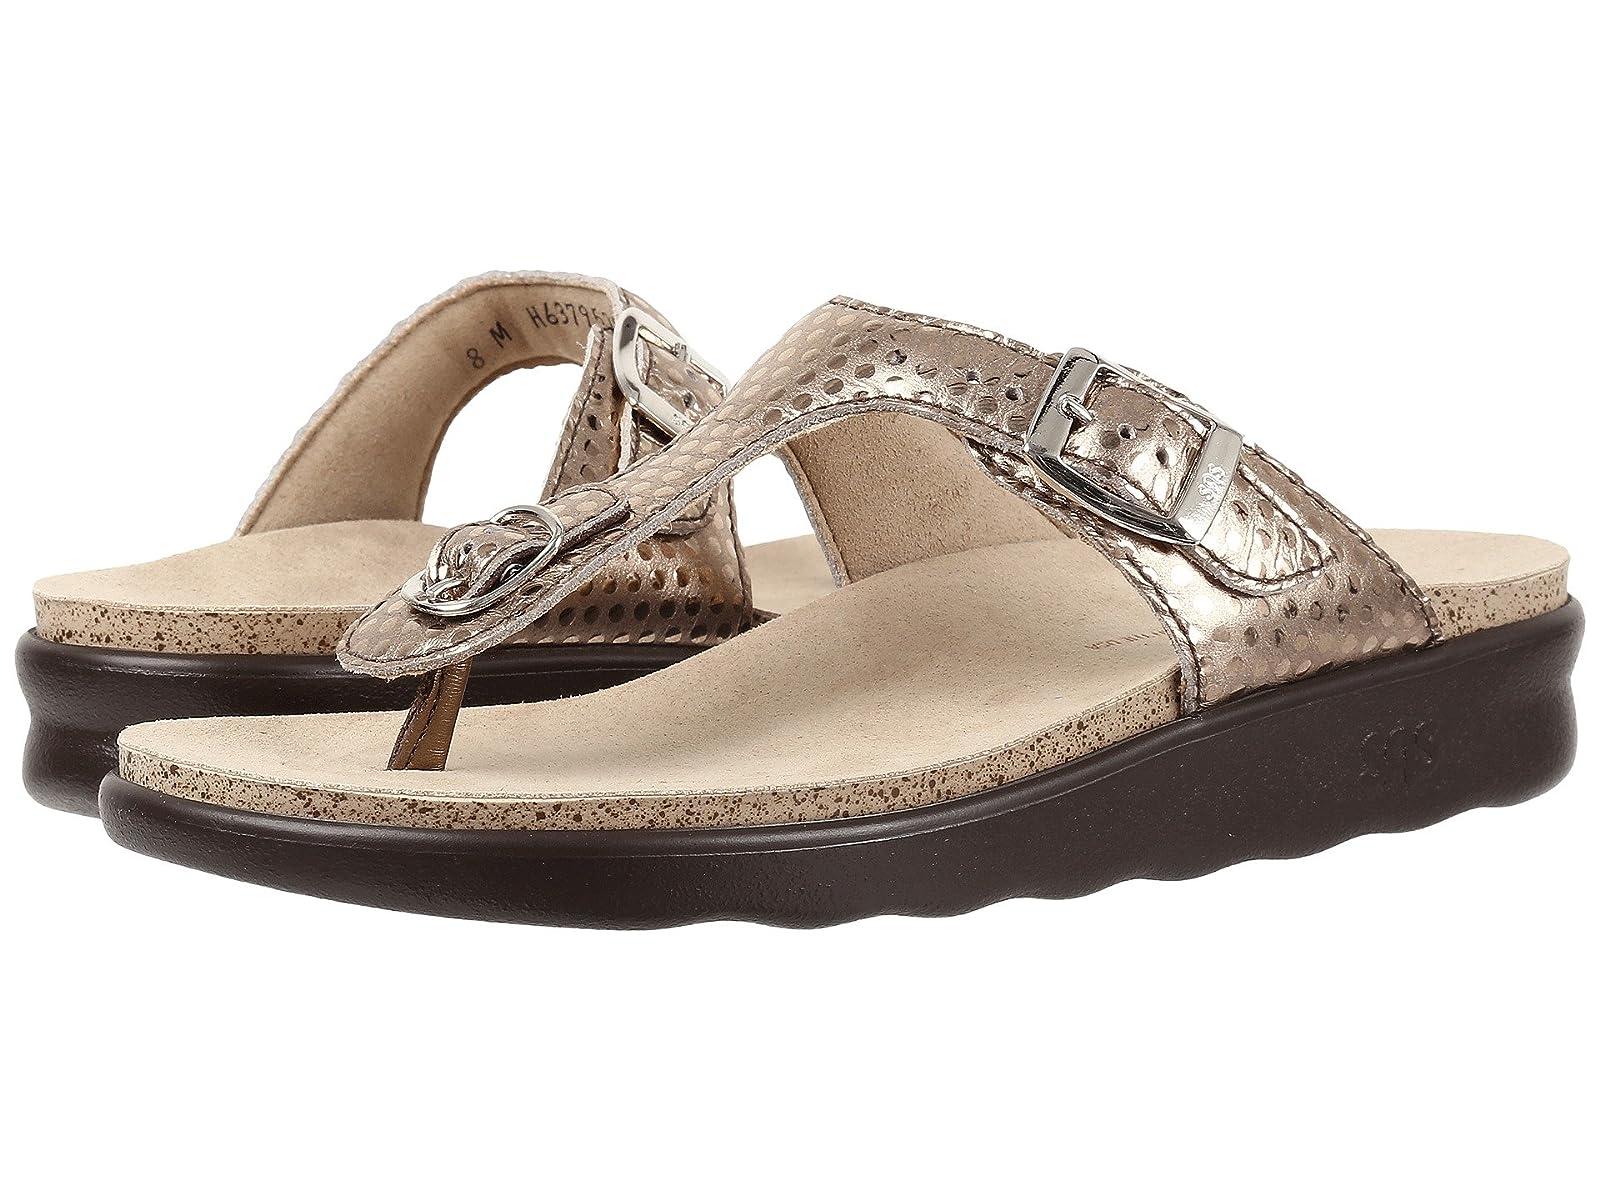 SAS SanibelAtmospheric grades have affordable shoes